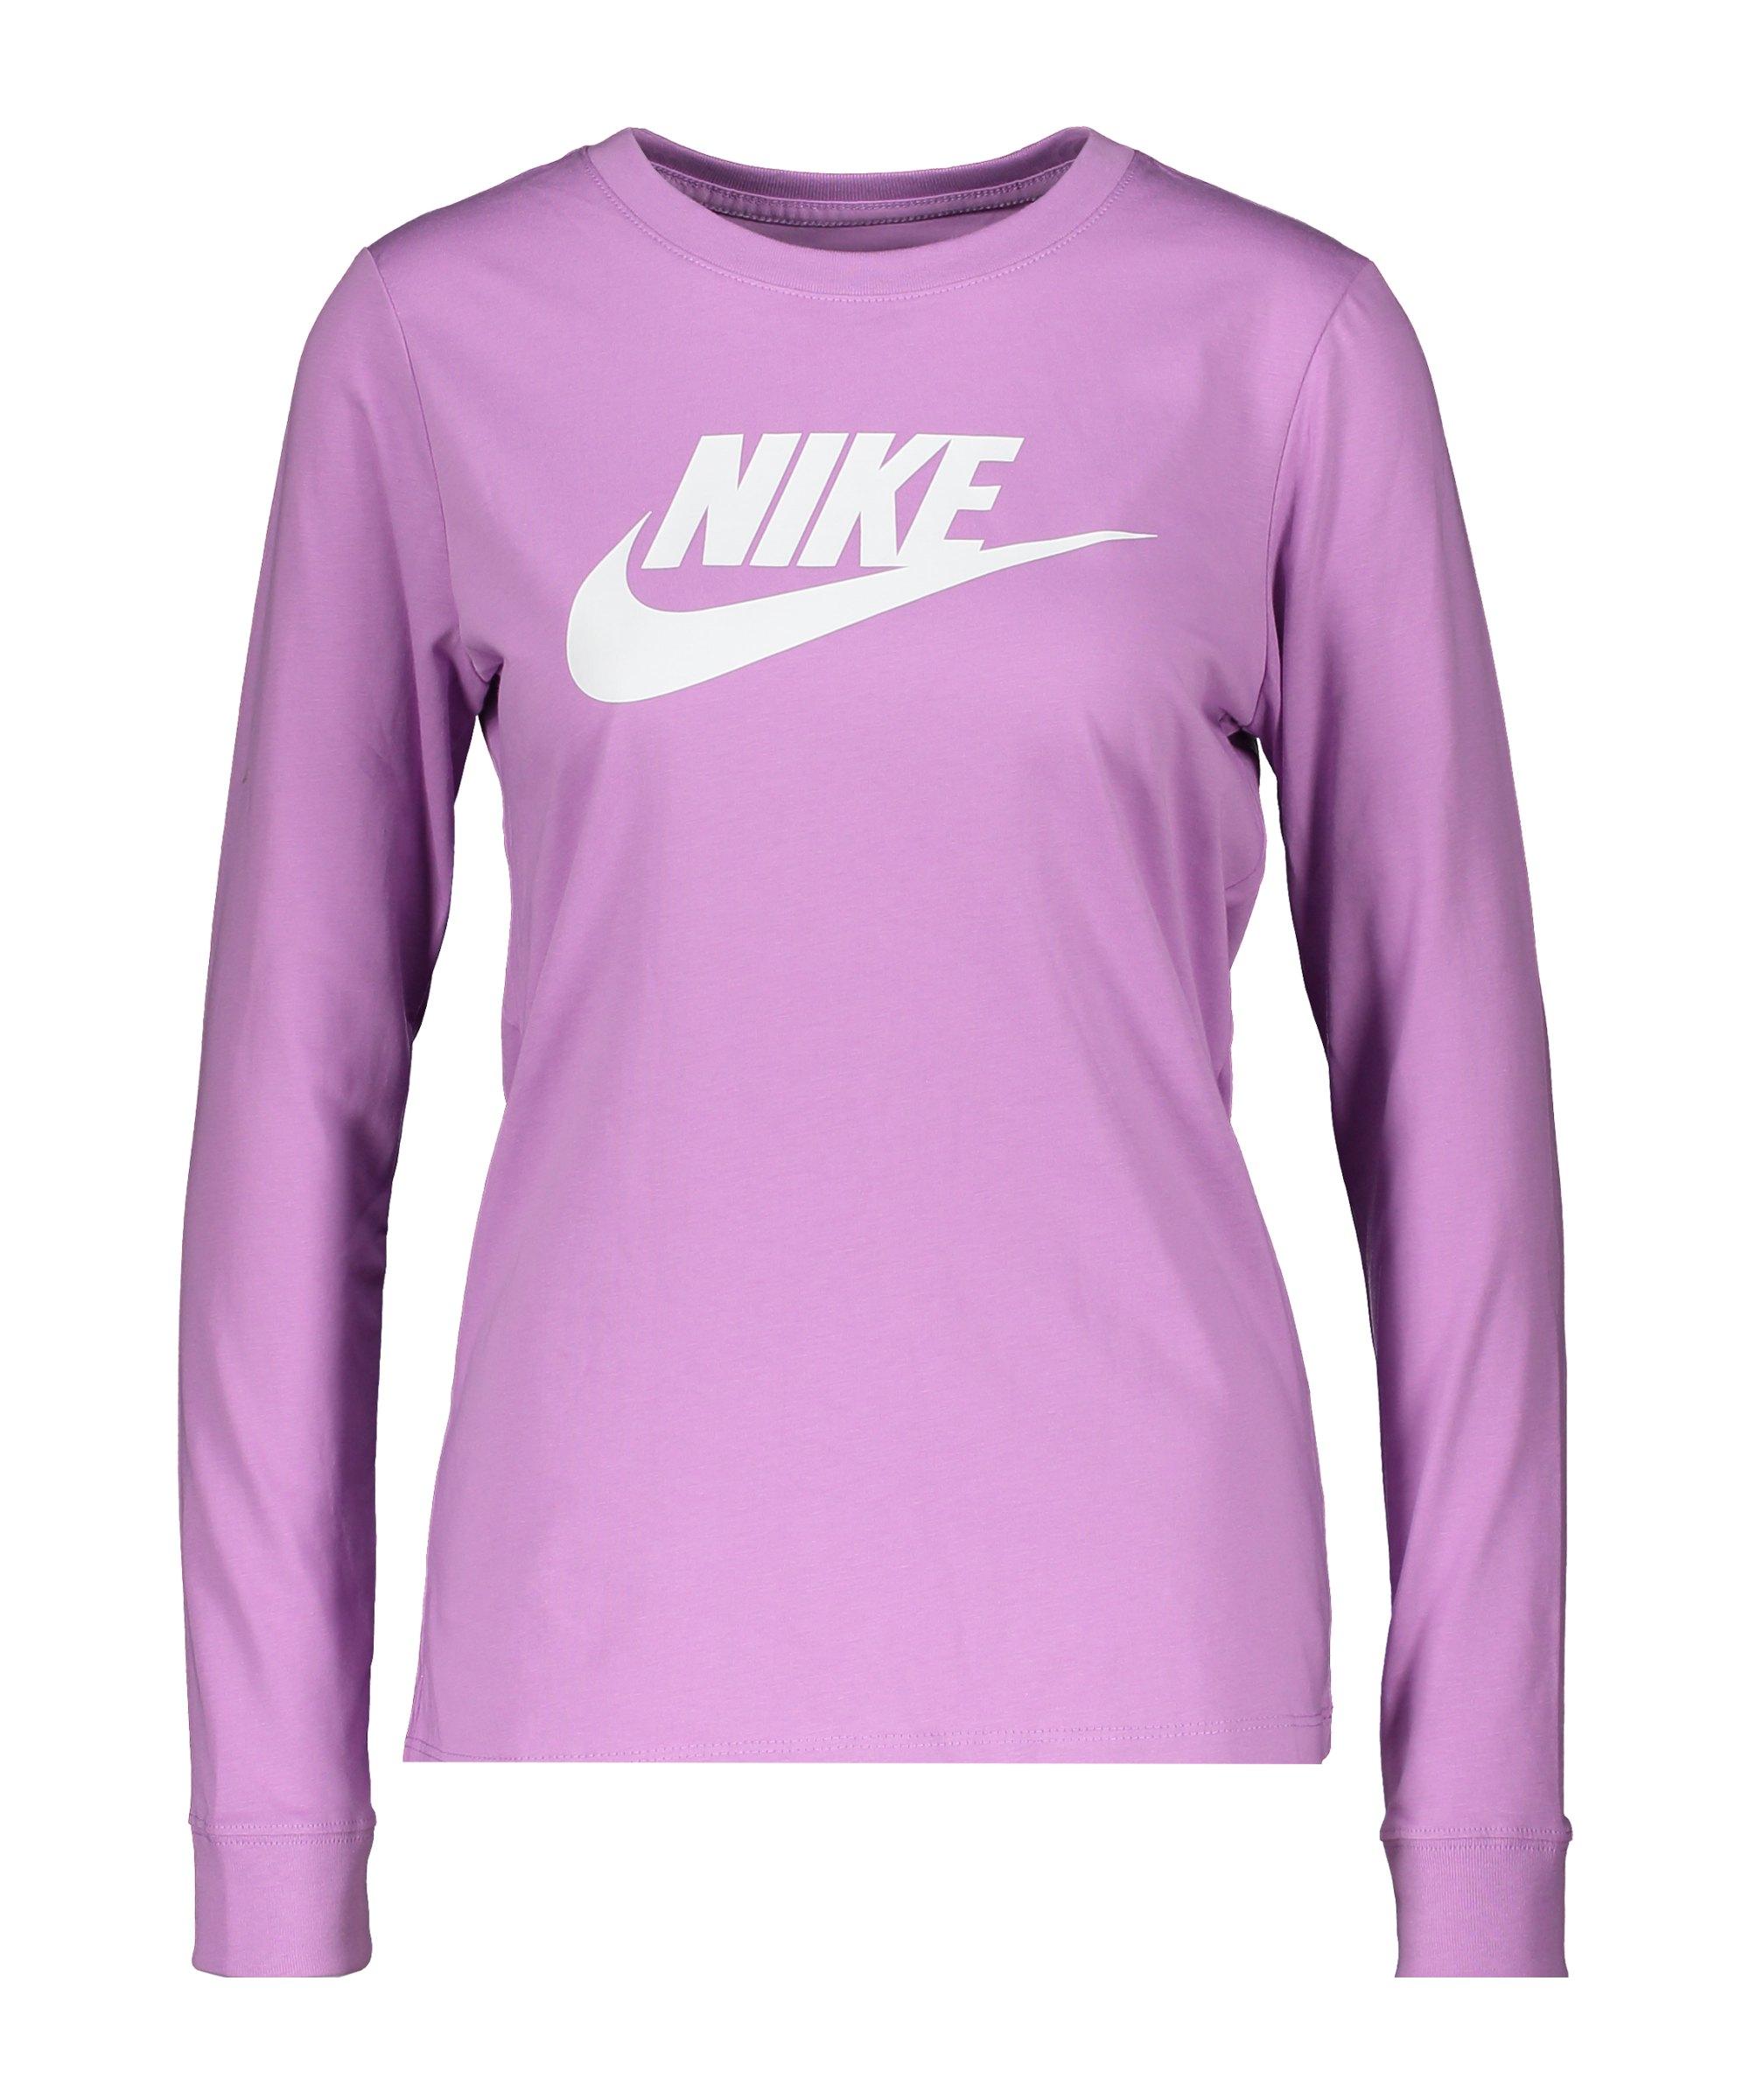 Nike Essential Sweatshirt Damen Lila Weiss F591 - lila